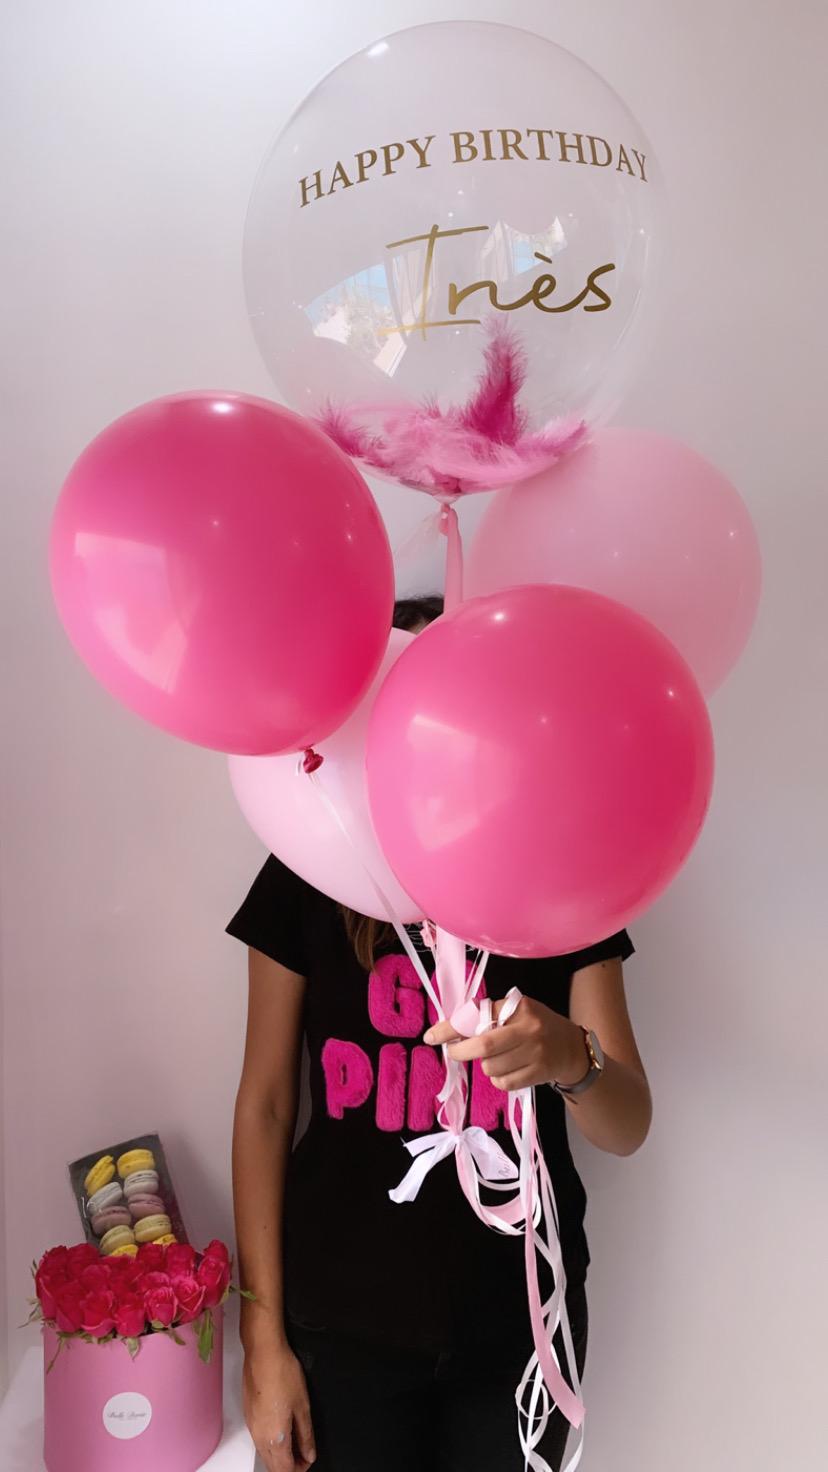 Ballon_personnalisé.JPG